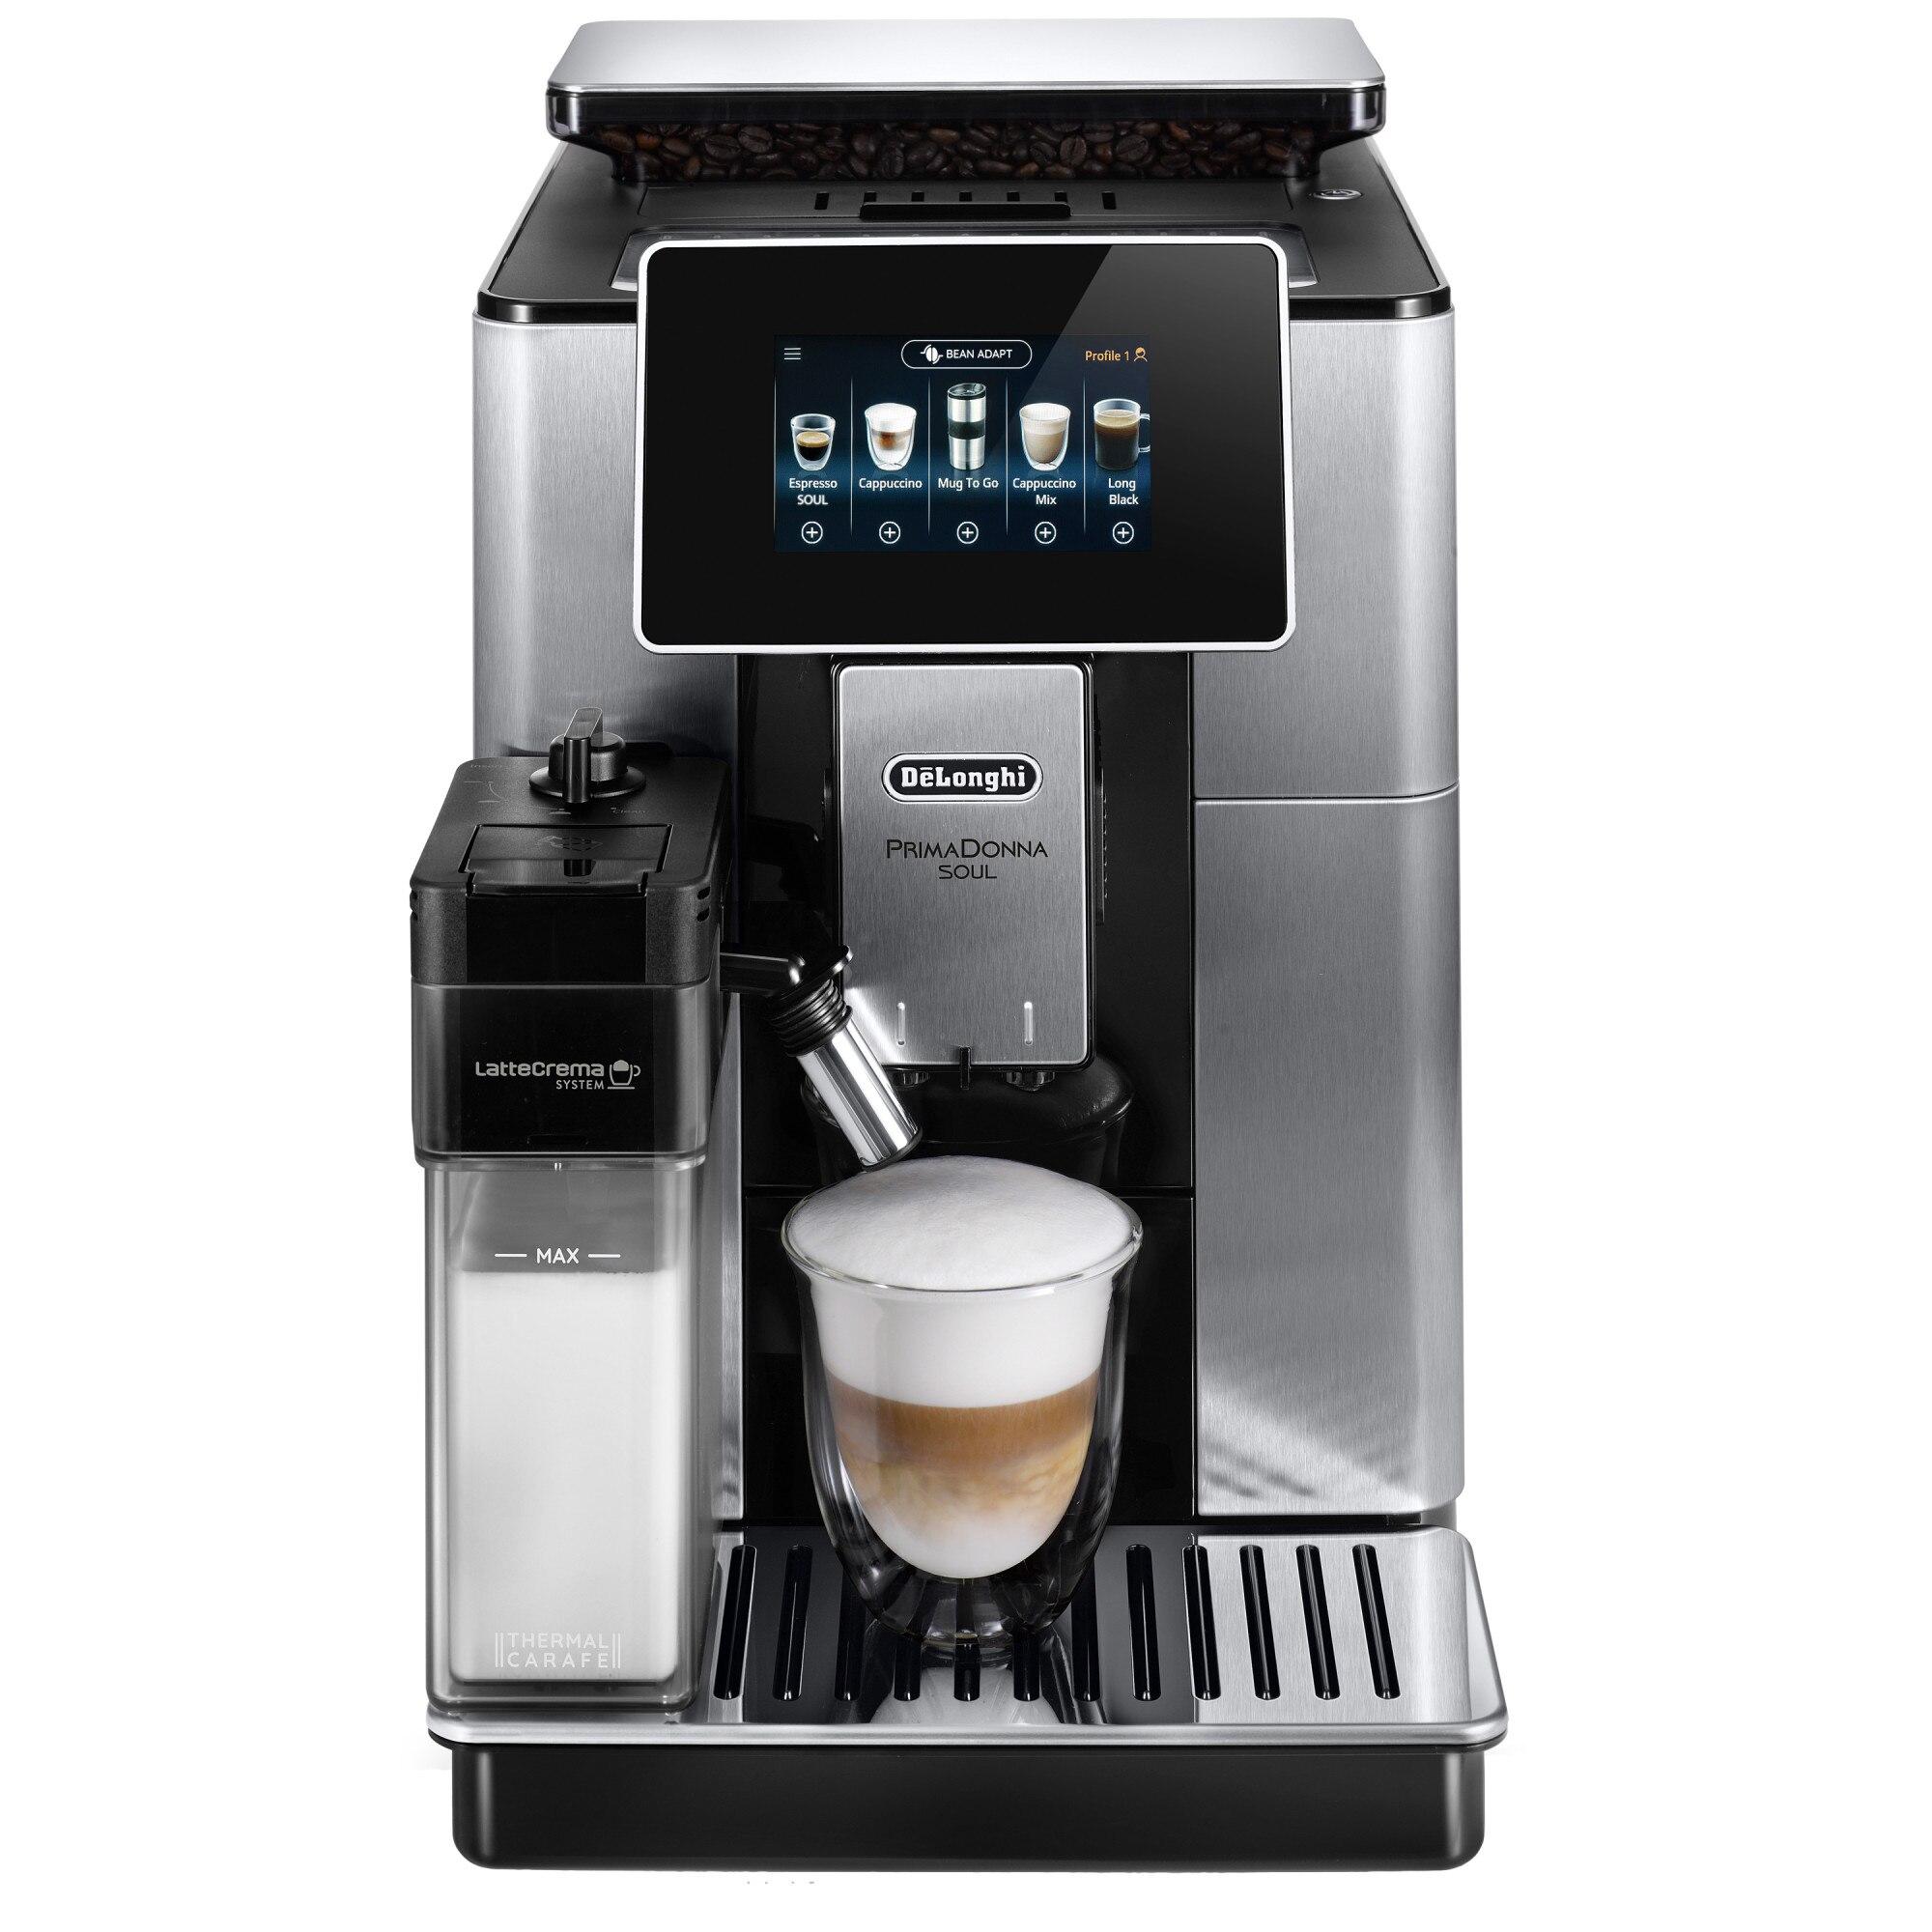 Fotografie Espressor automat De'Longhi PrimaDonna SOUL ECAM 610.74.MB, 1450W, 19 bar, 2.2 l, LatteCrema System, Argintiu Negru